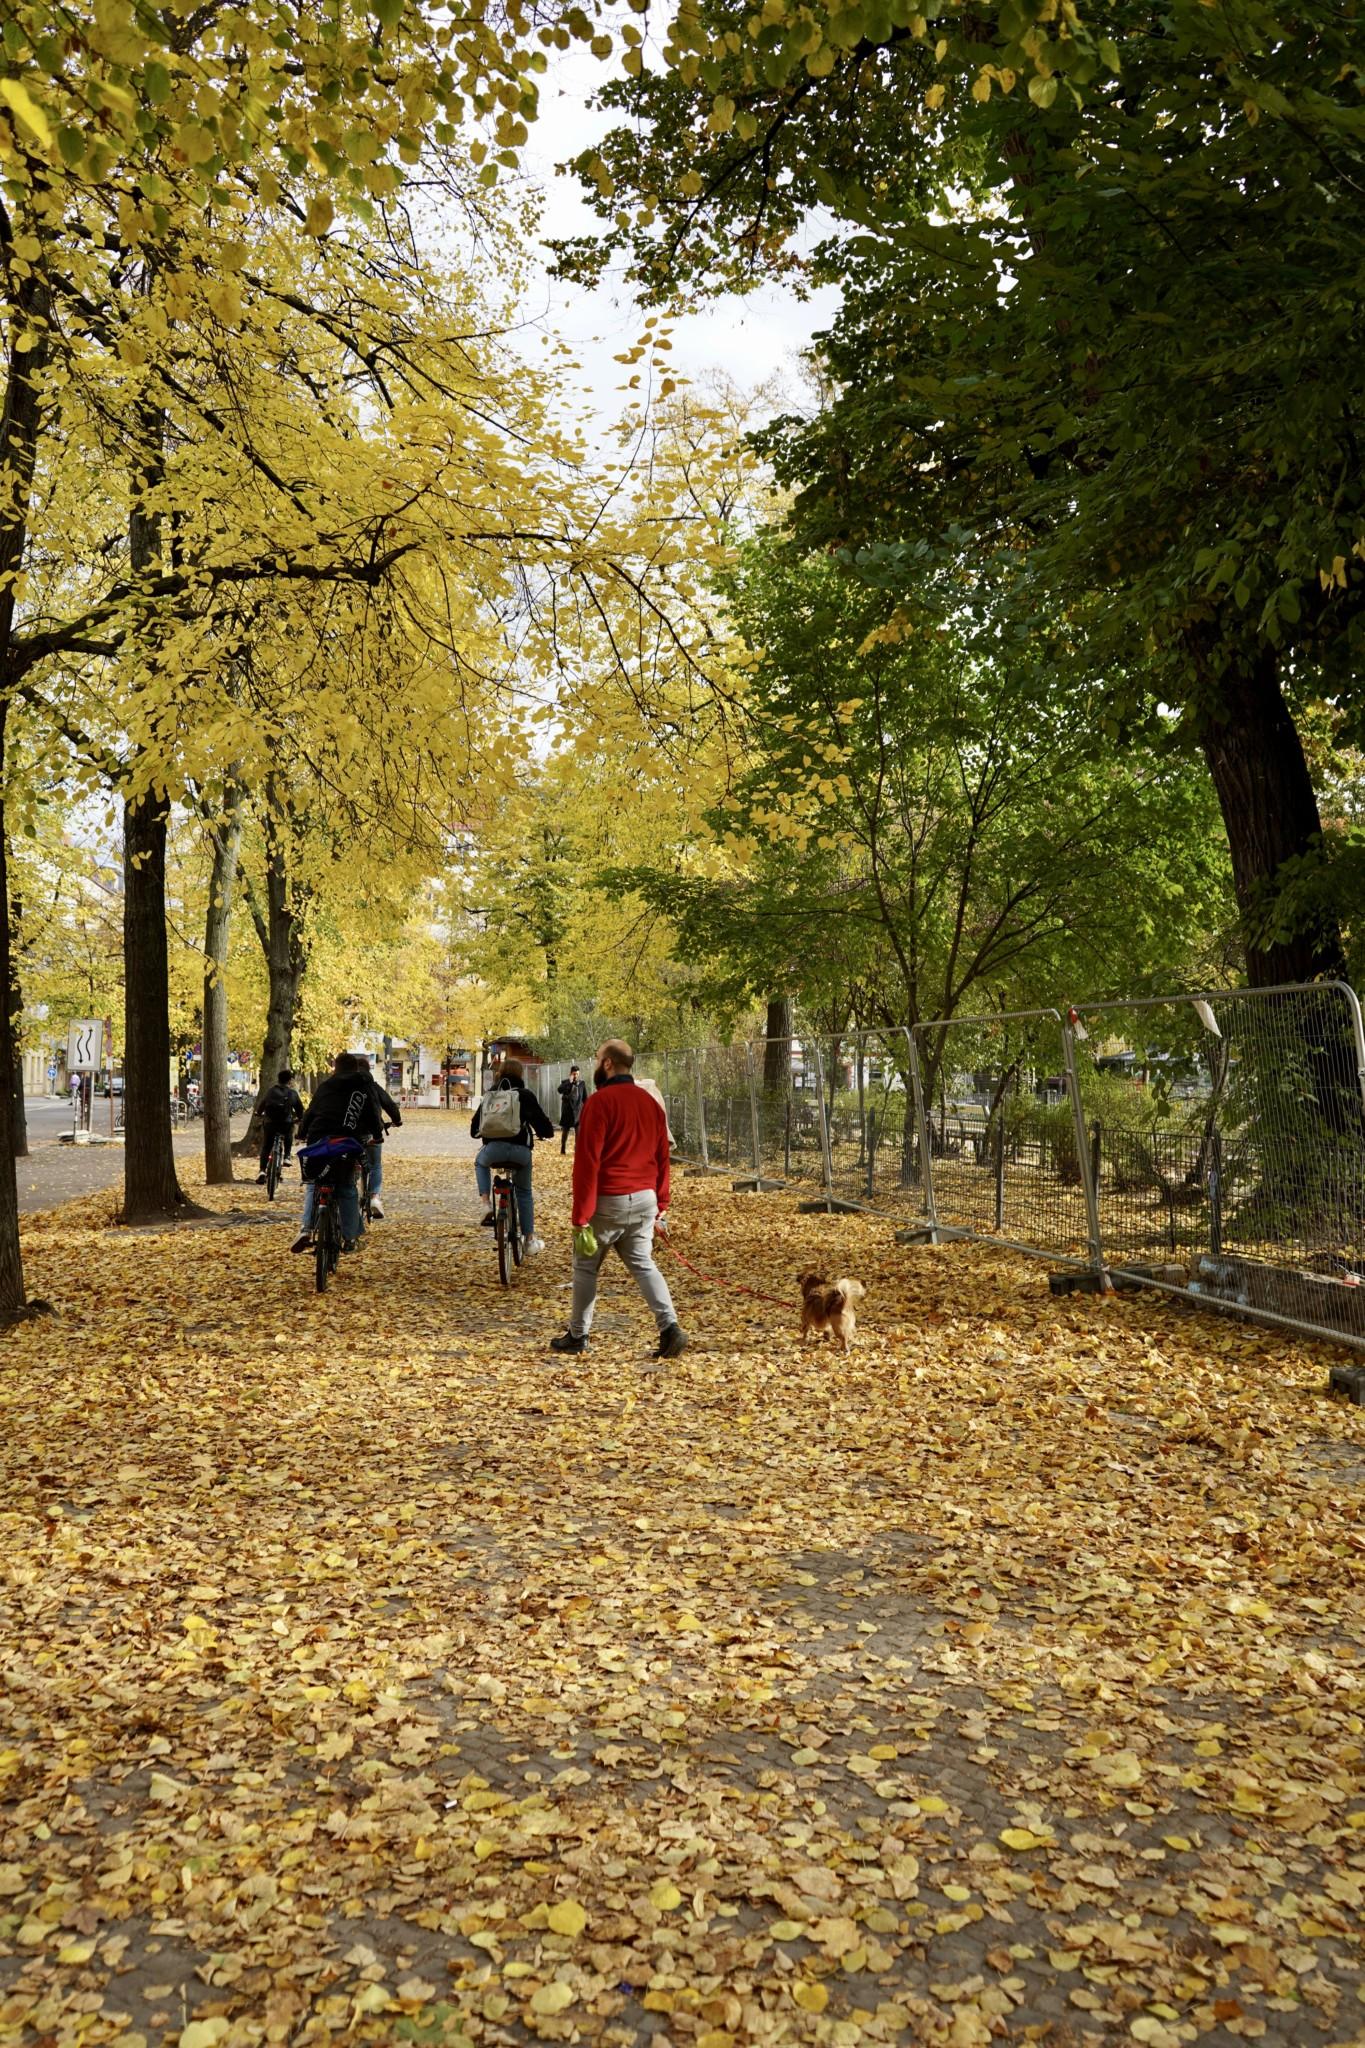 Spaziergang am Boxhagener Platz